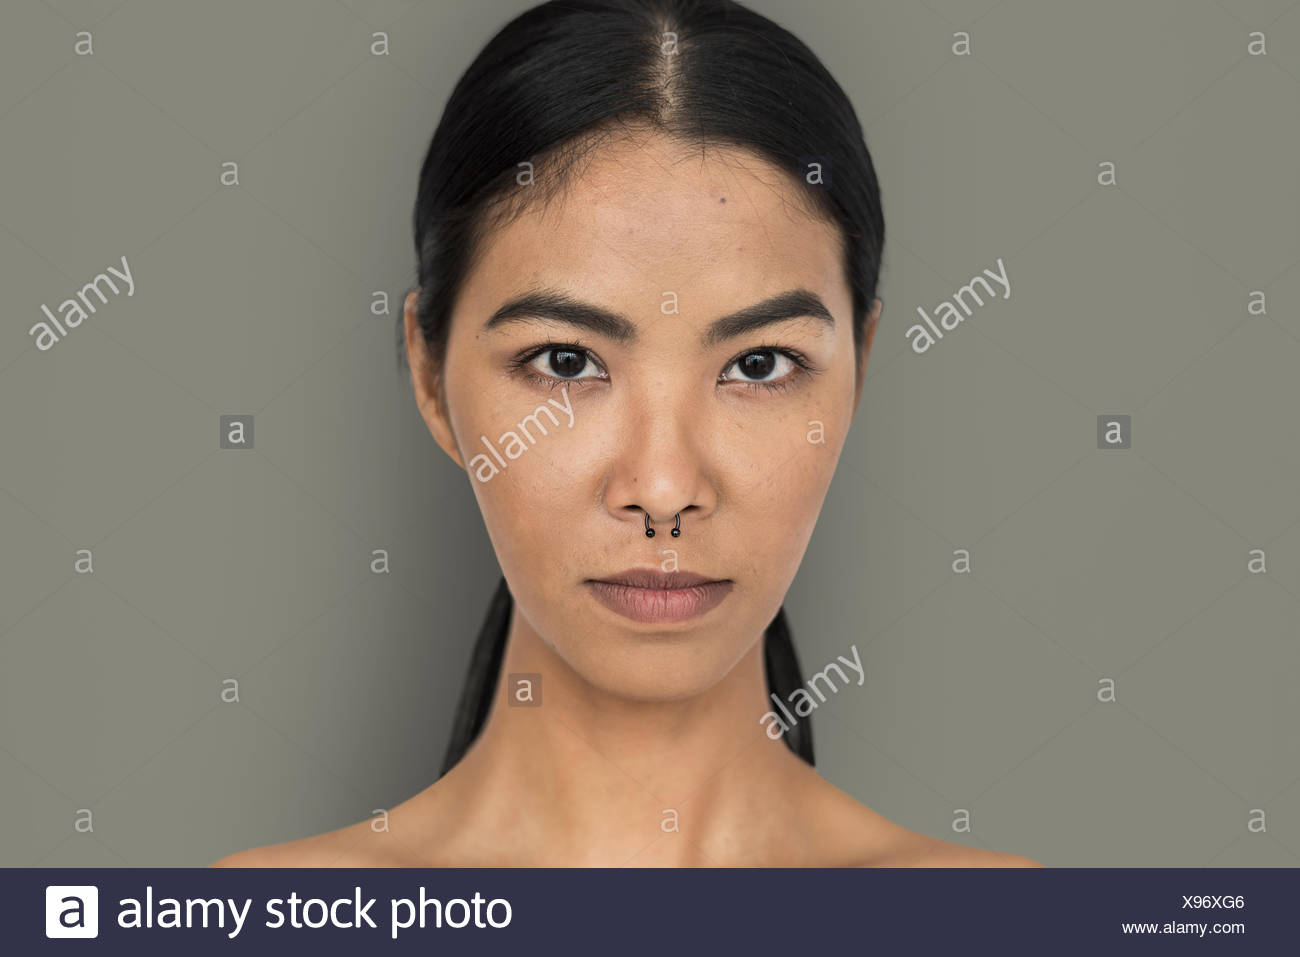 88df2b436f158 Woman Pierced Nose Ring Confidence Self Esteem Portrait - Stock Image